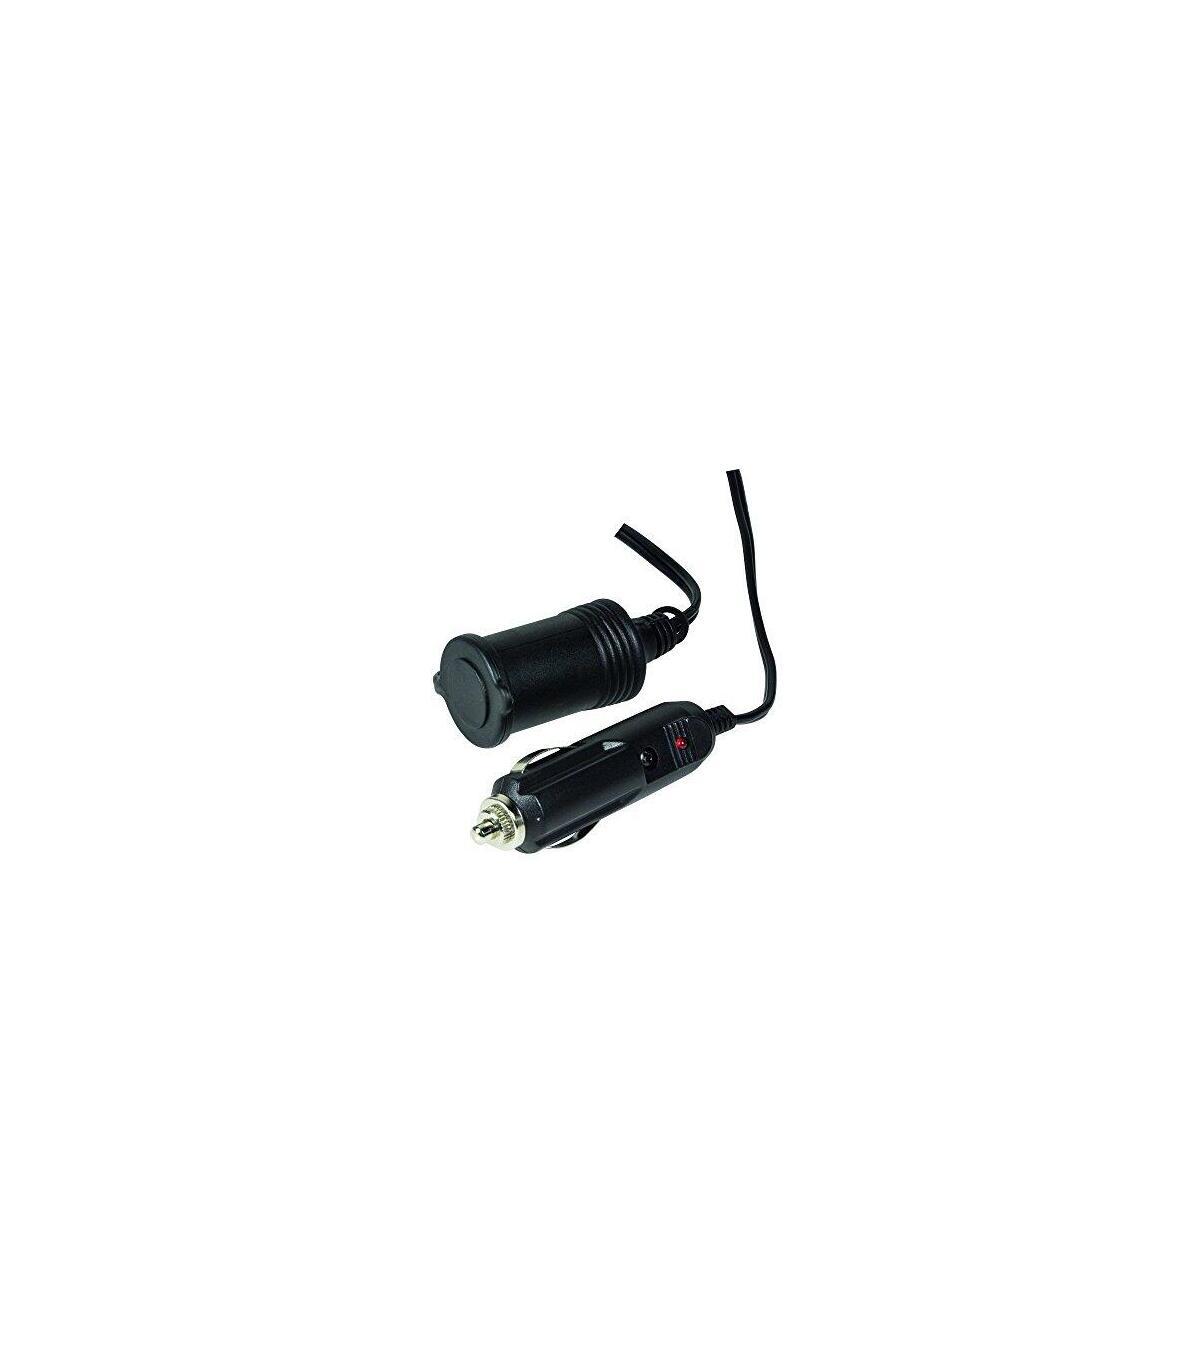 Hama coche Encendedor Socket Splitter 1 A 2